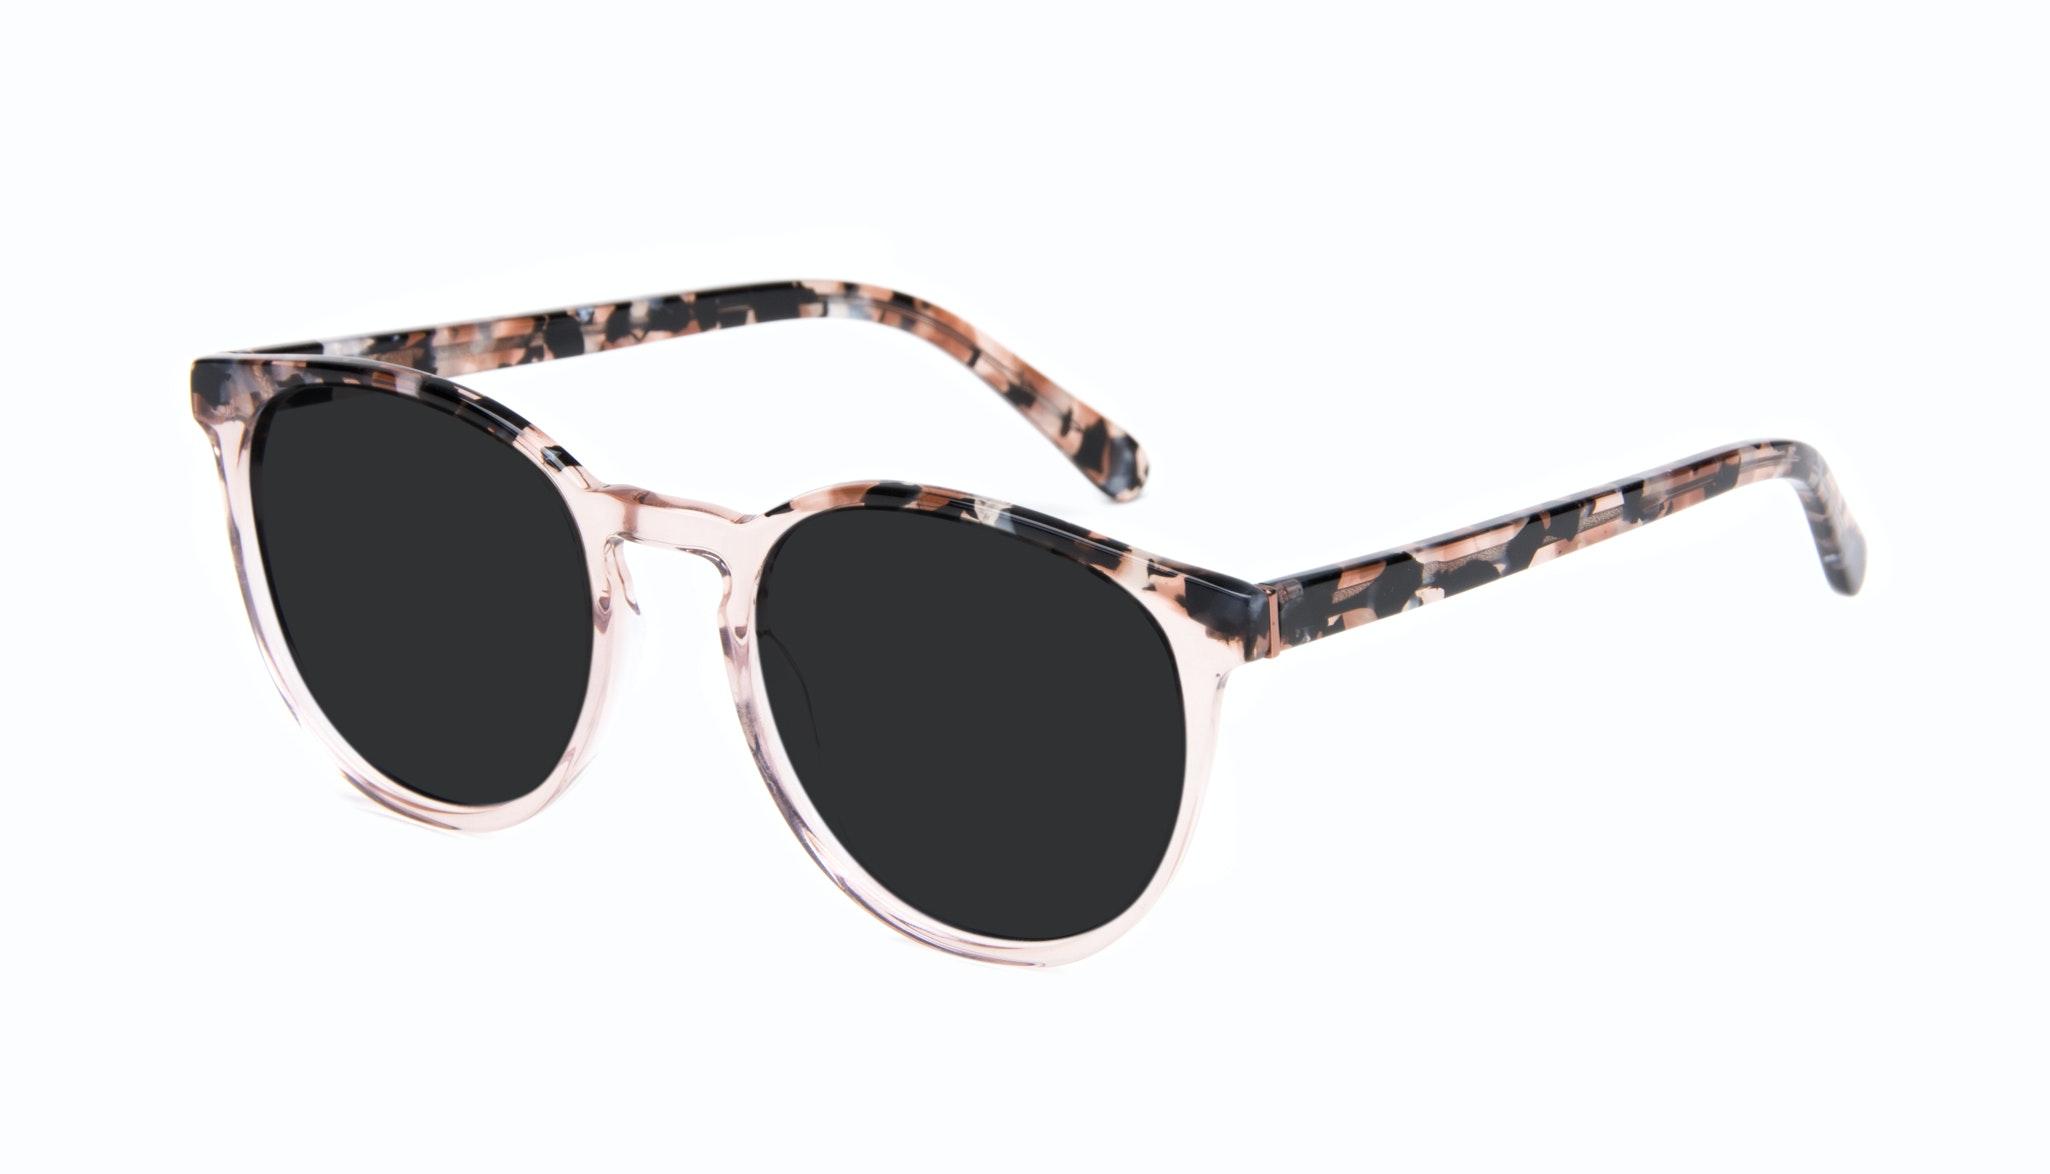 Affordable Fashion Glasses Round Sunglasses Women Brilliant Rose Tort Tilt